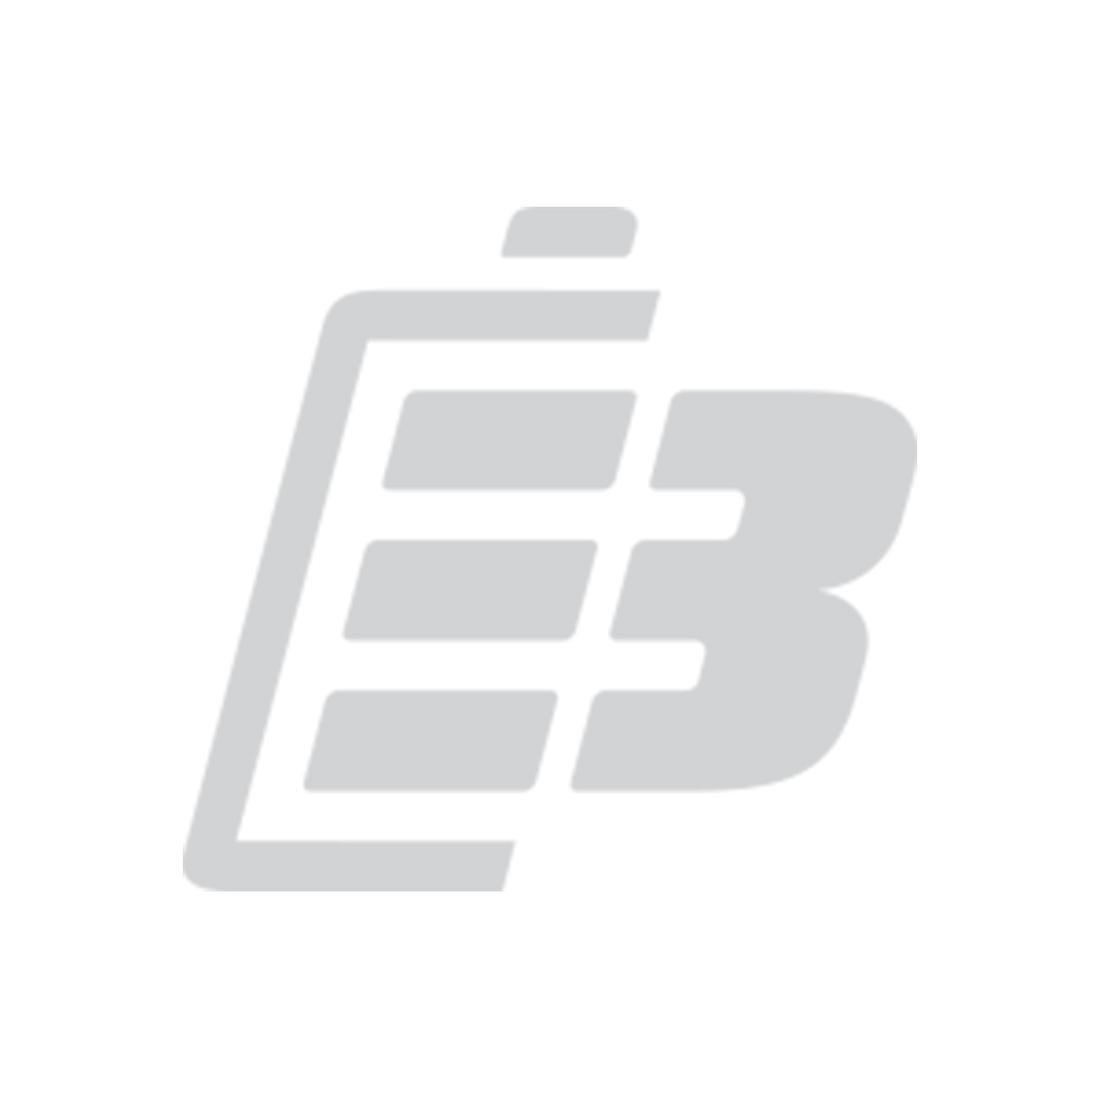 Samsung INR18650-25R battery 18650 2500mah_1